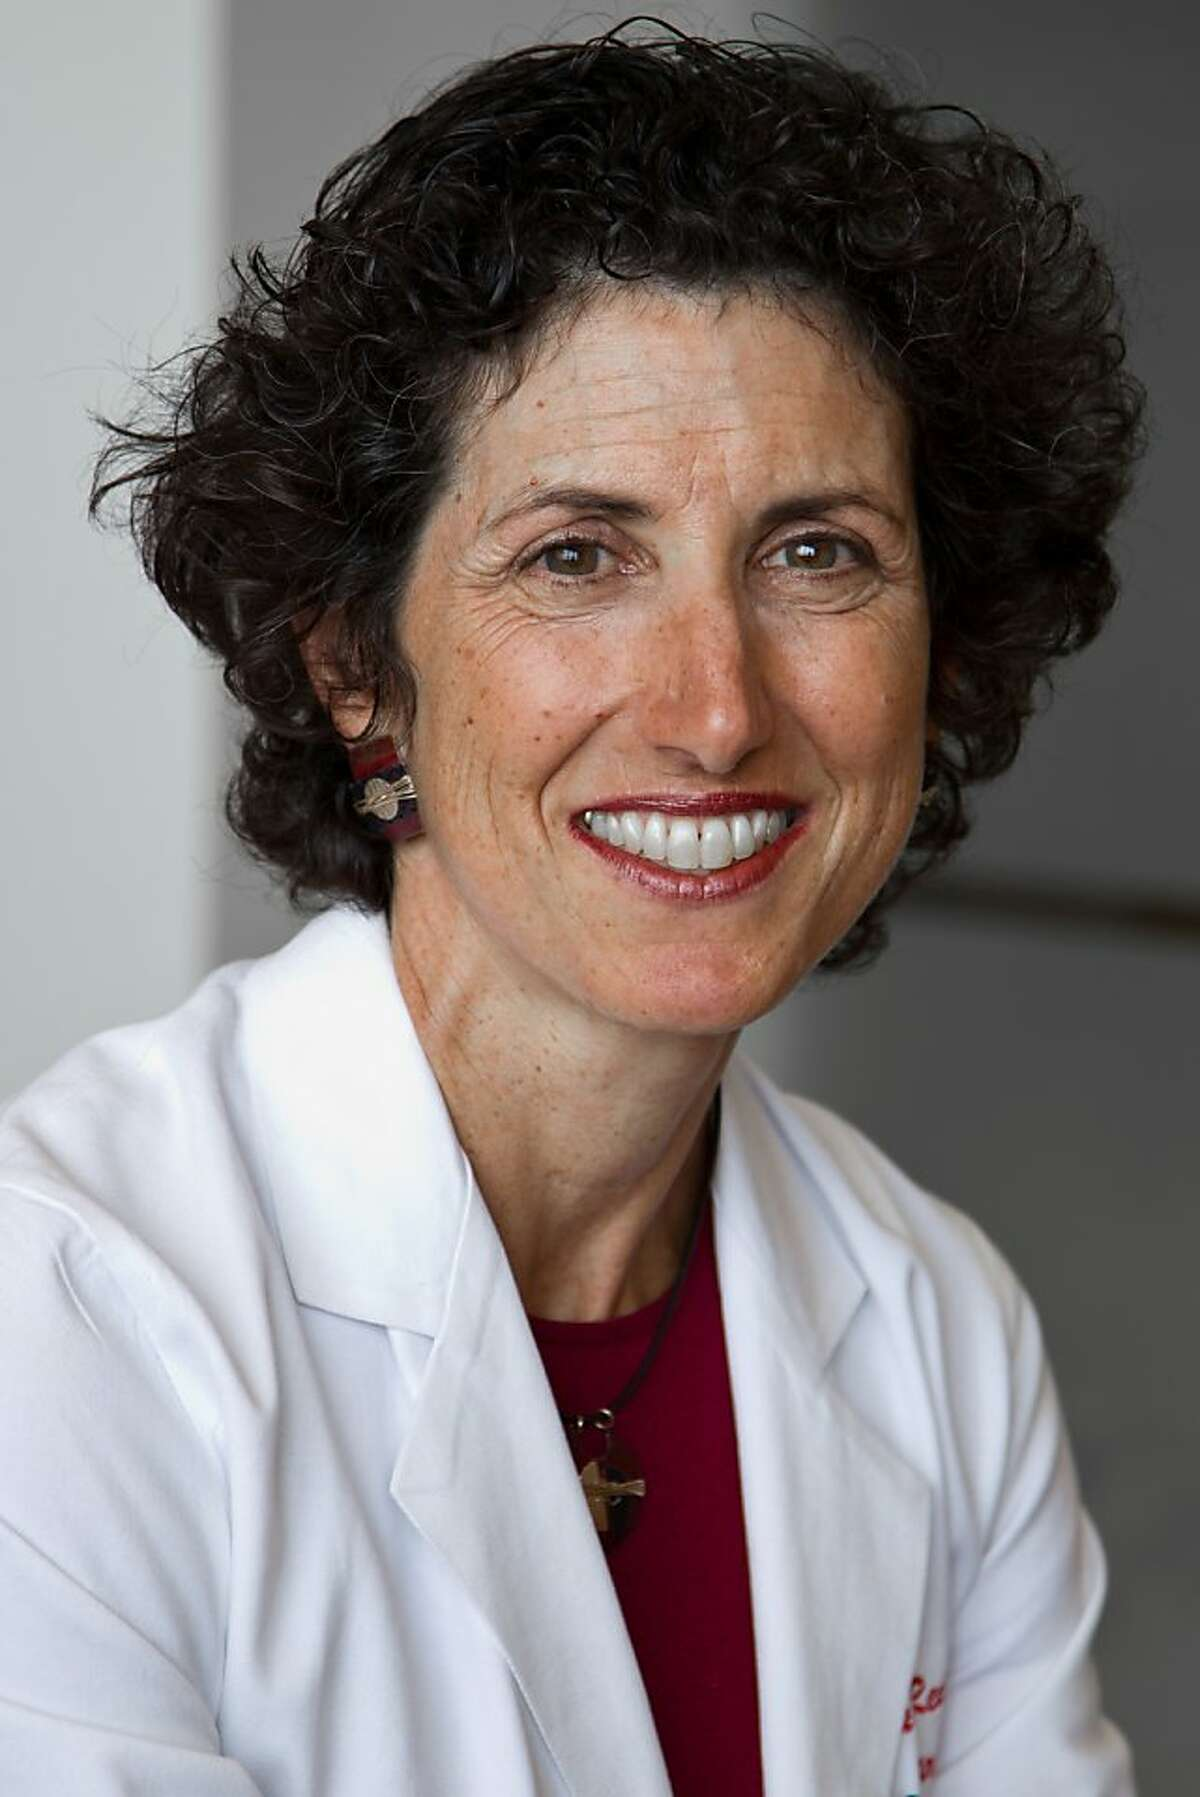 Dr. Rita Redberg